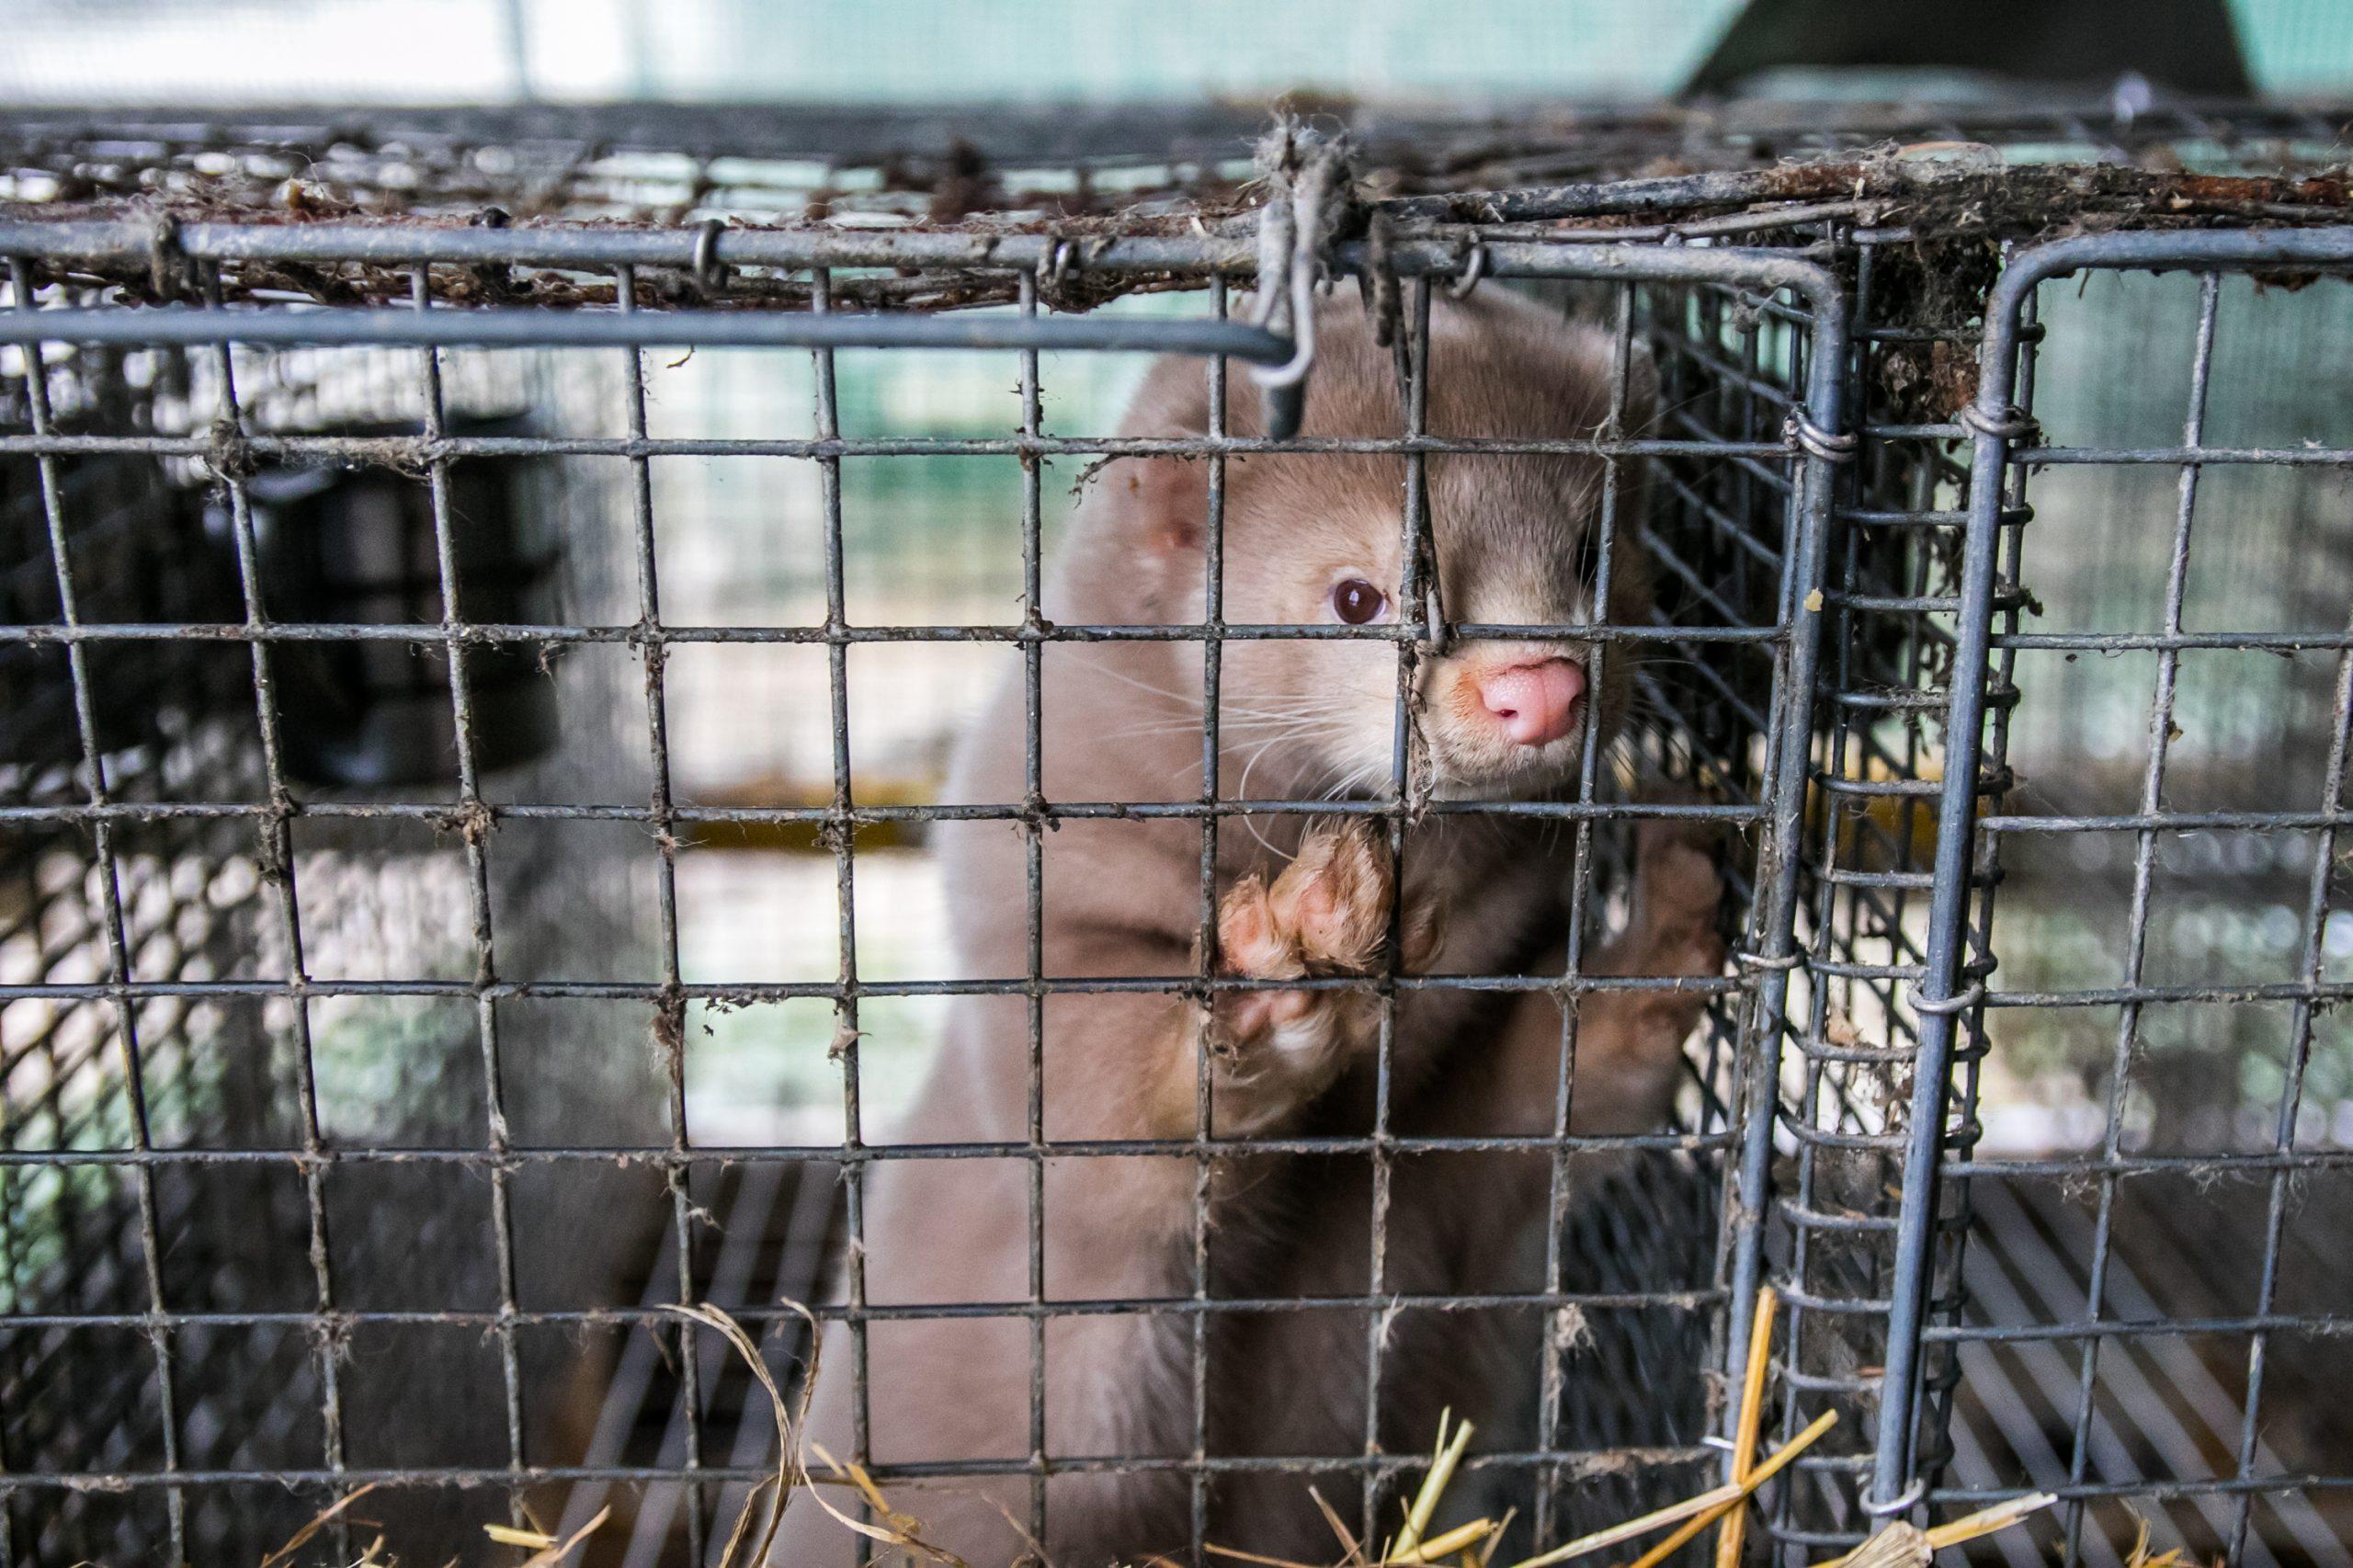 mink fur farm